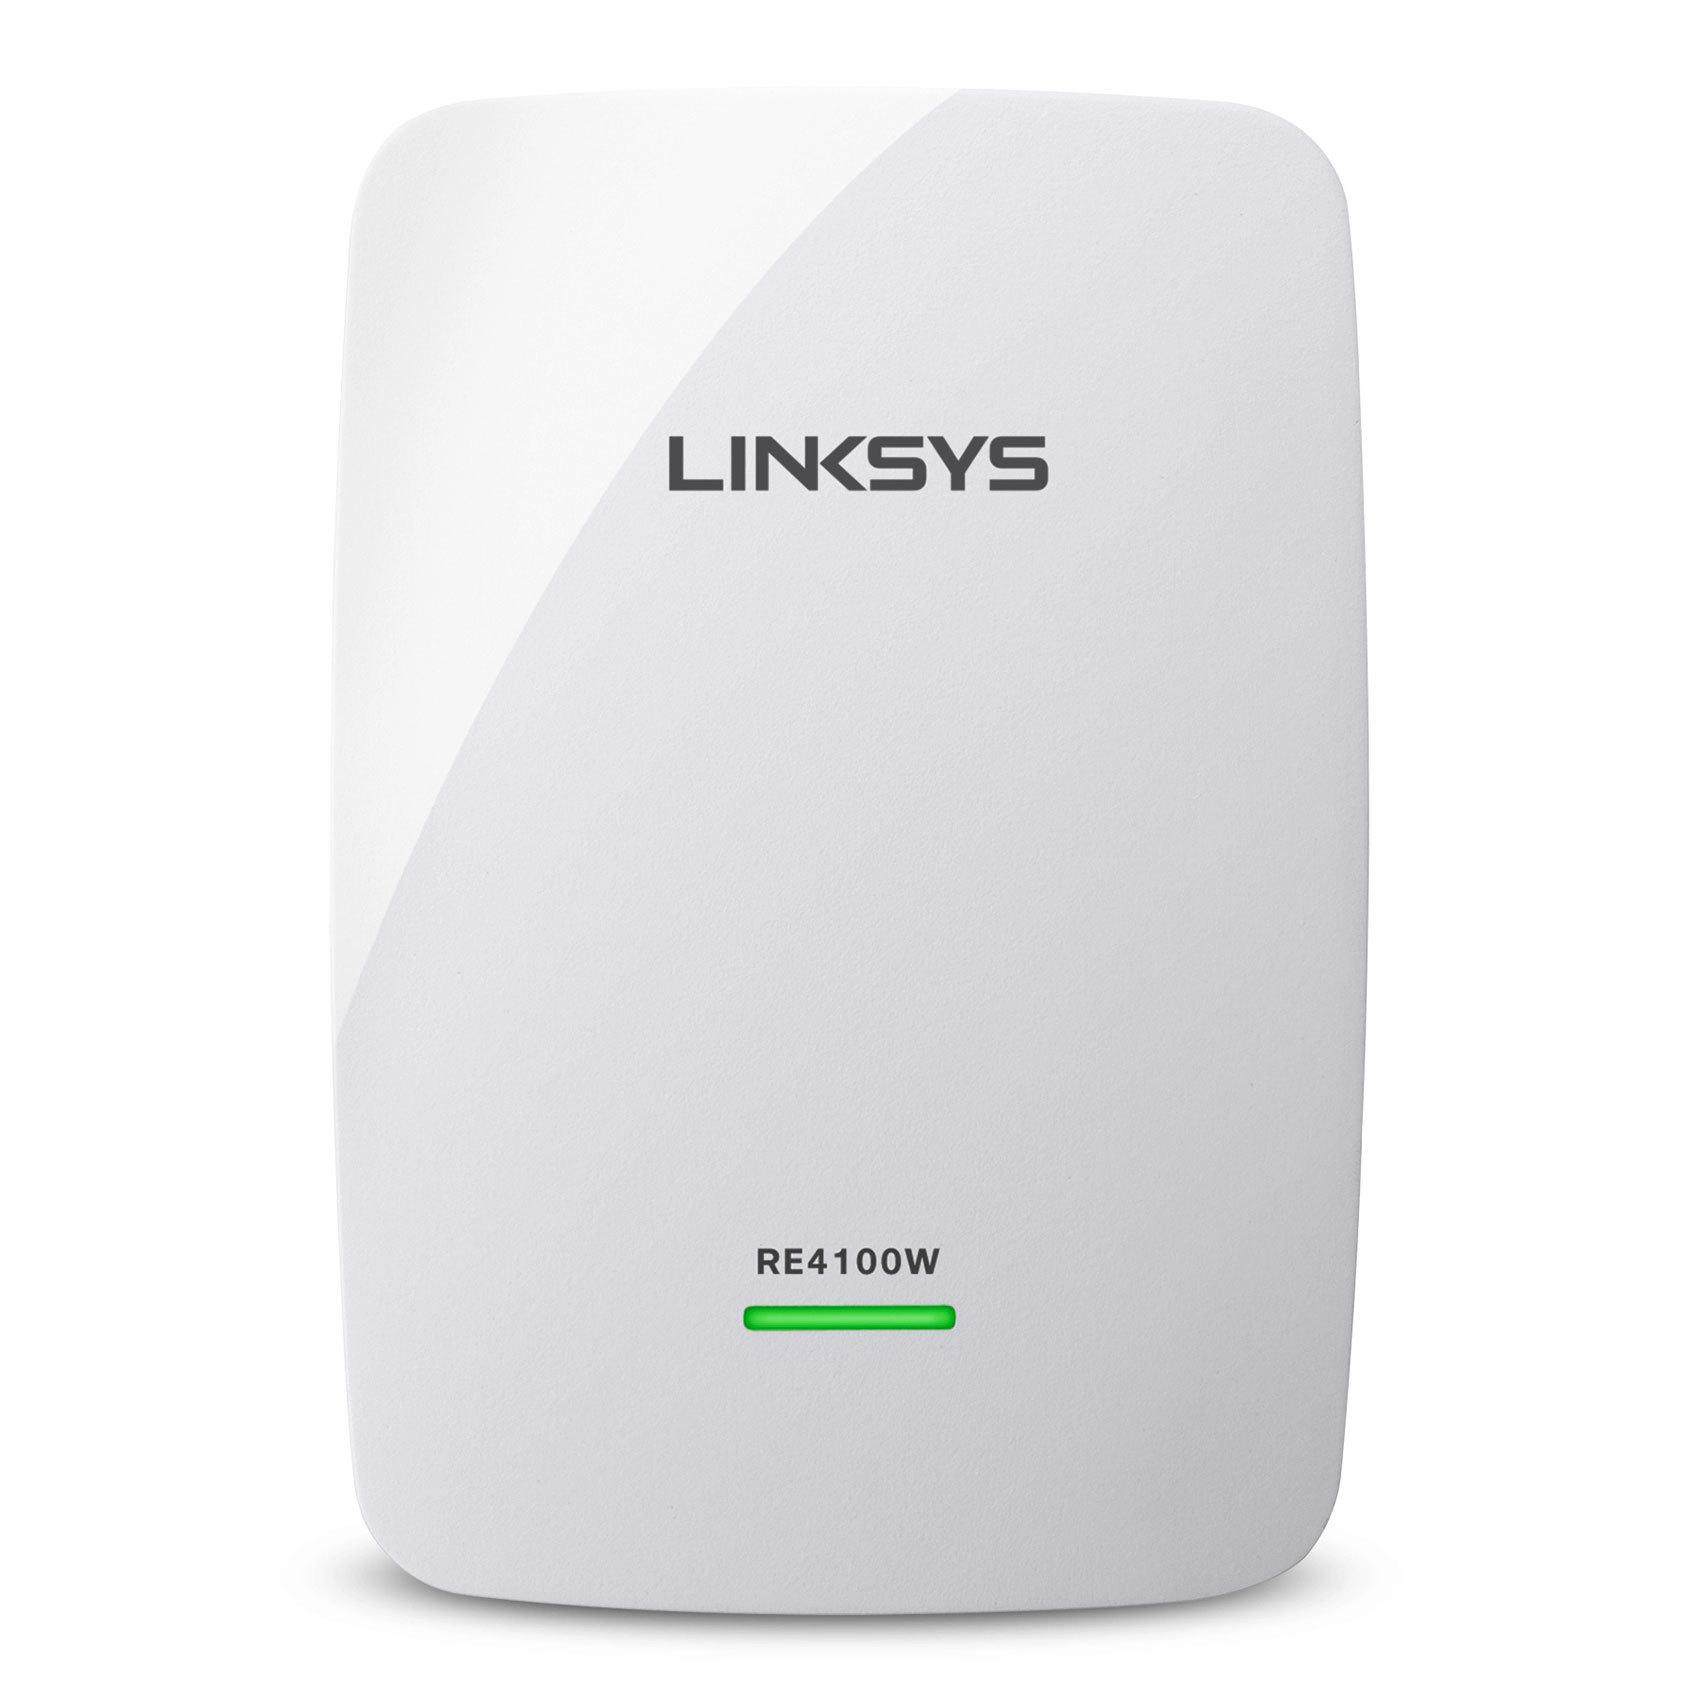 LINKSYS W/L RE RE4100W